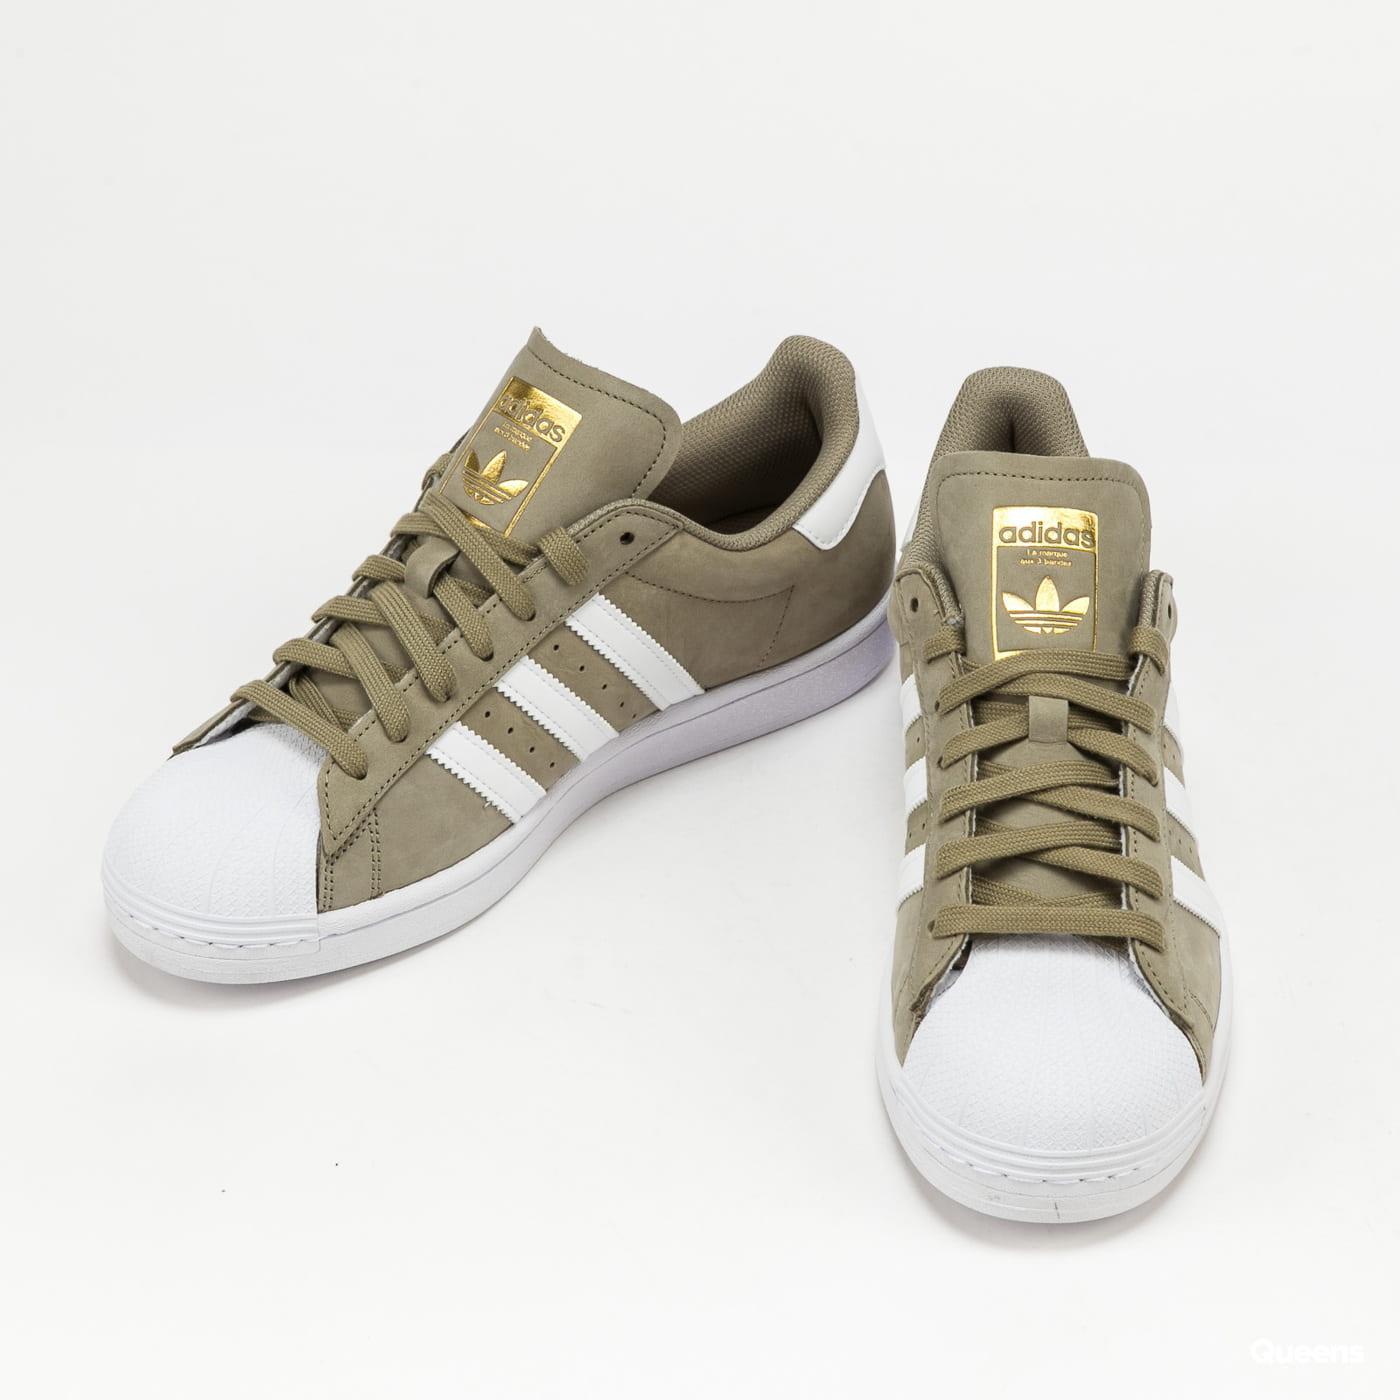 adidas Originals Superstar orbgrn / ftwwht / goldmt